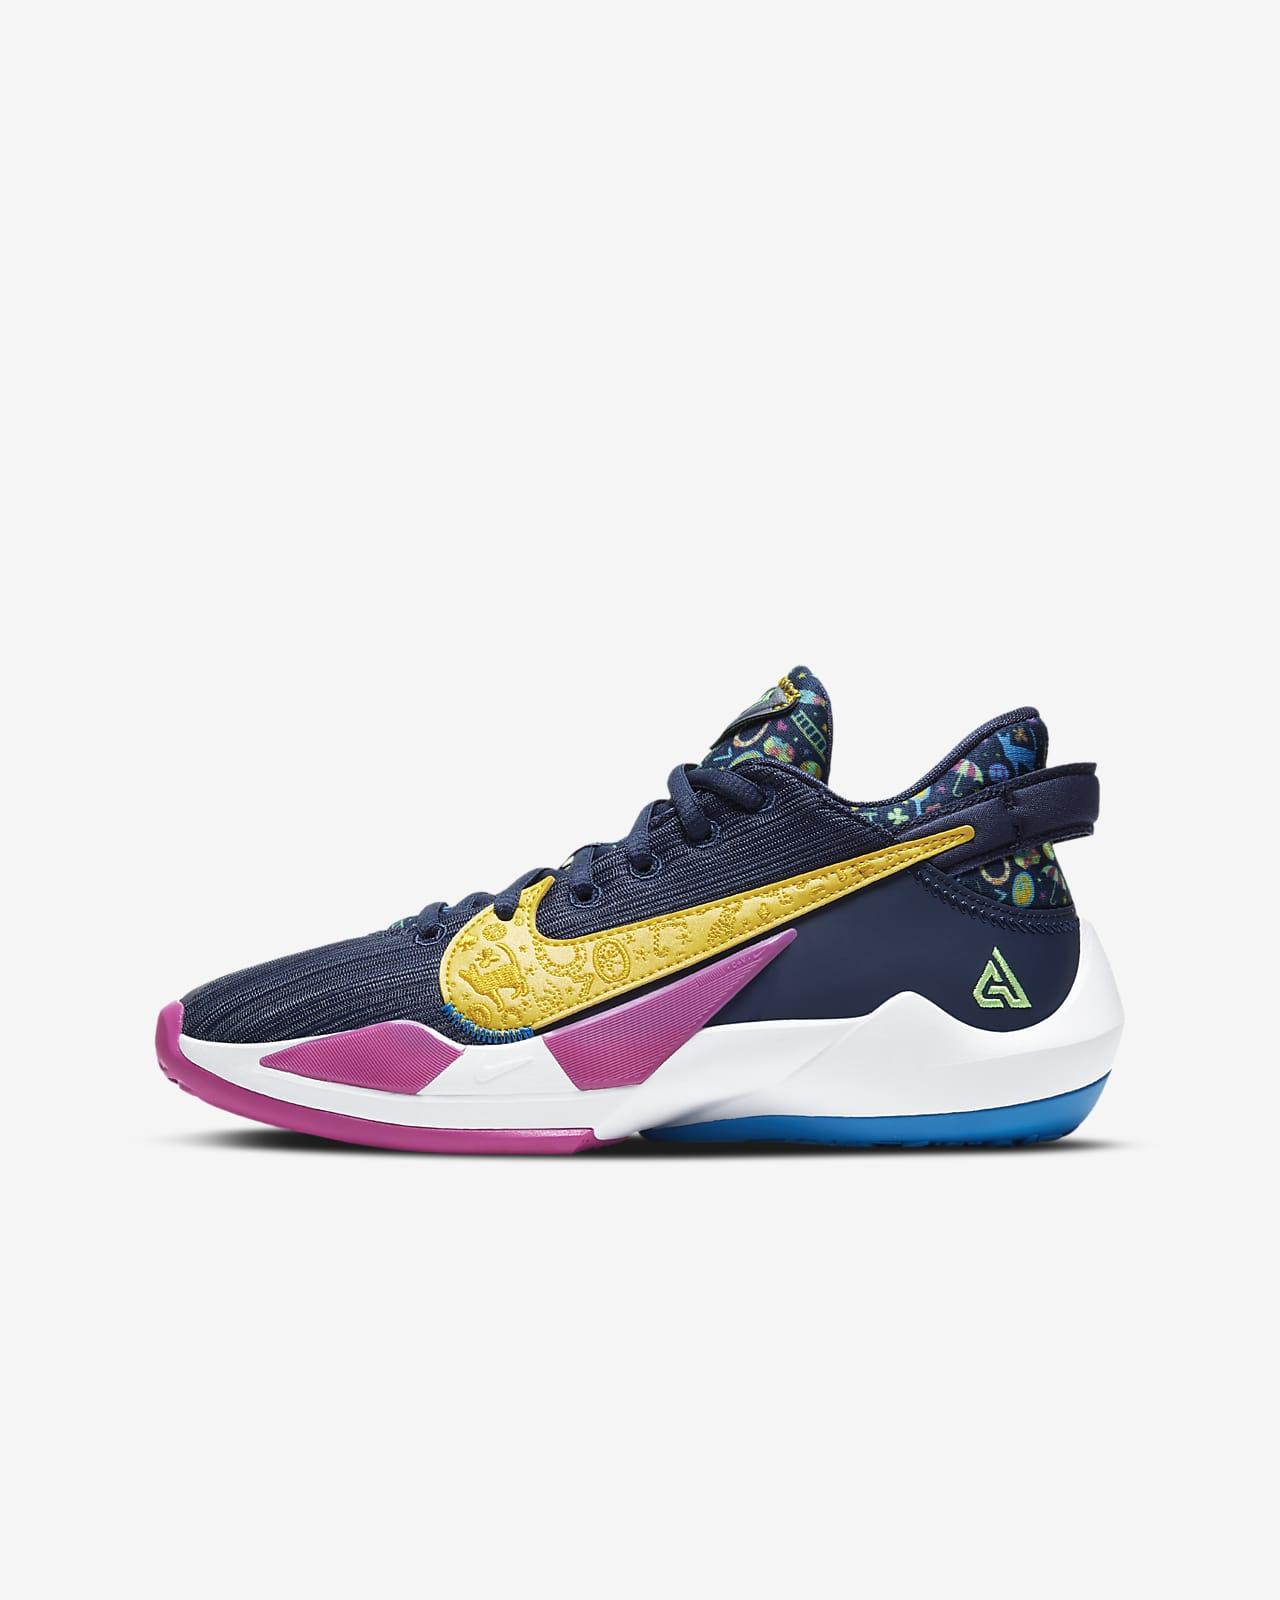 Nike Freak 2 PE (GS) 大童篮球童鞋